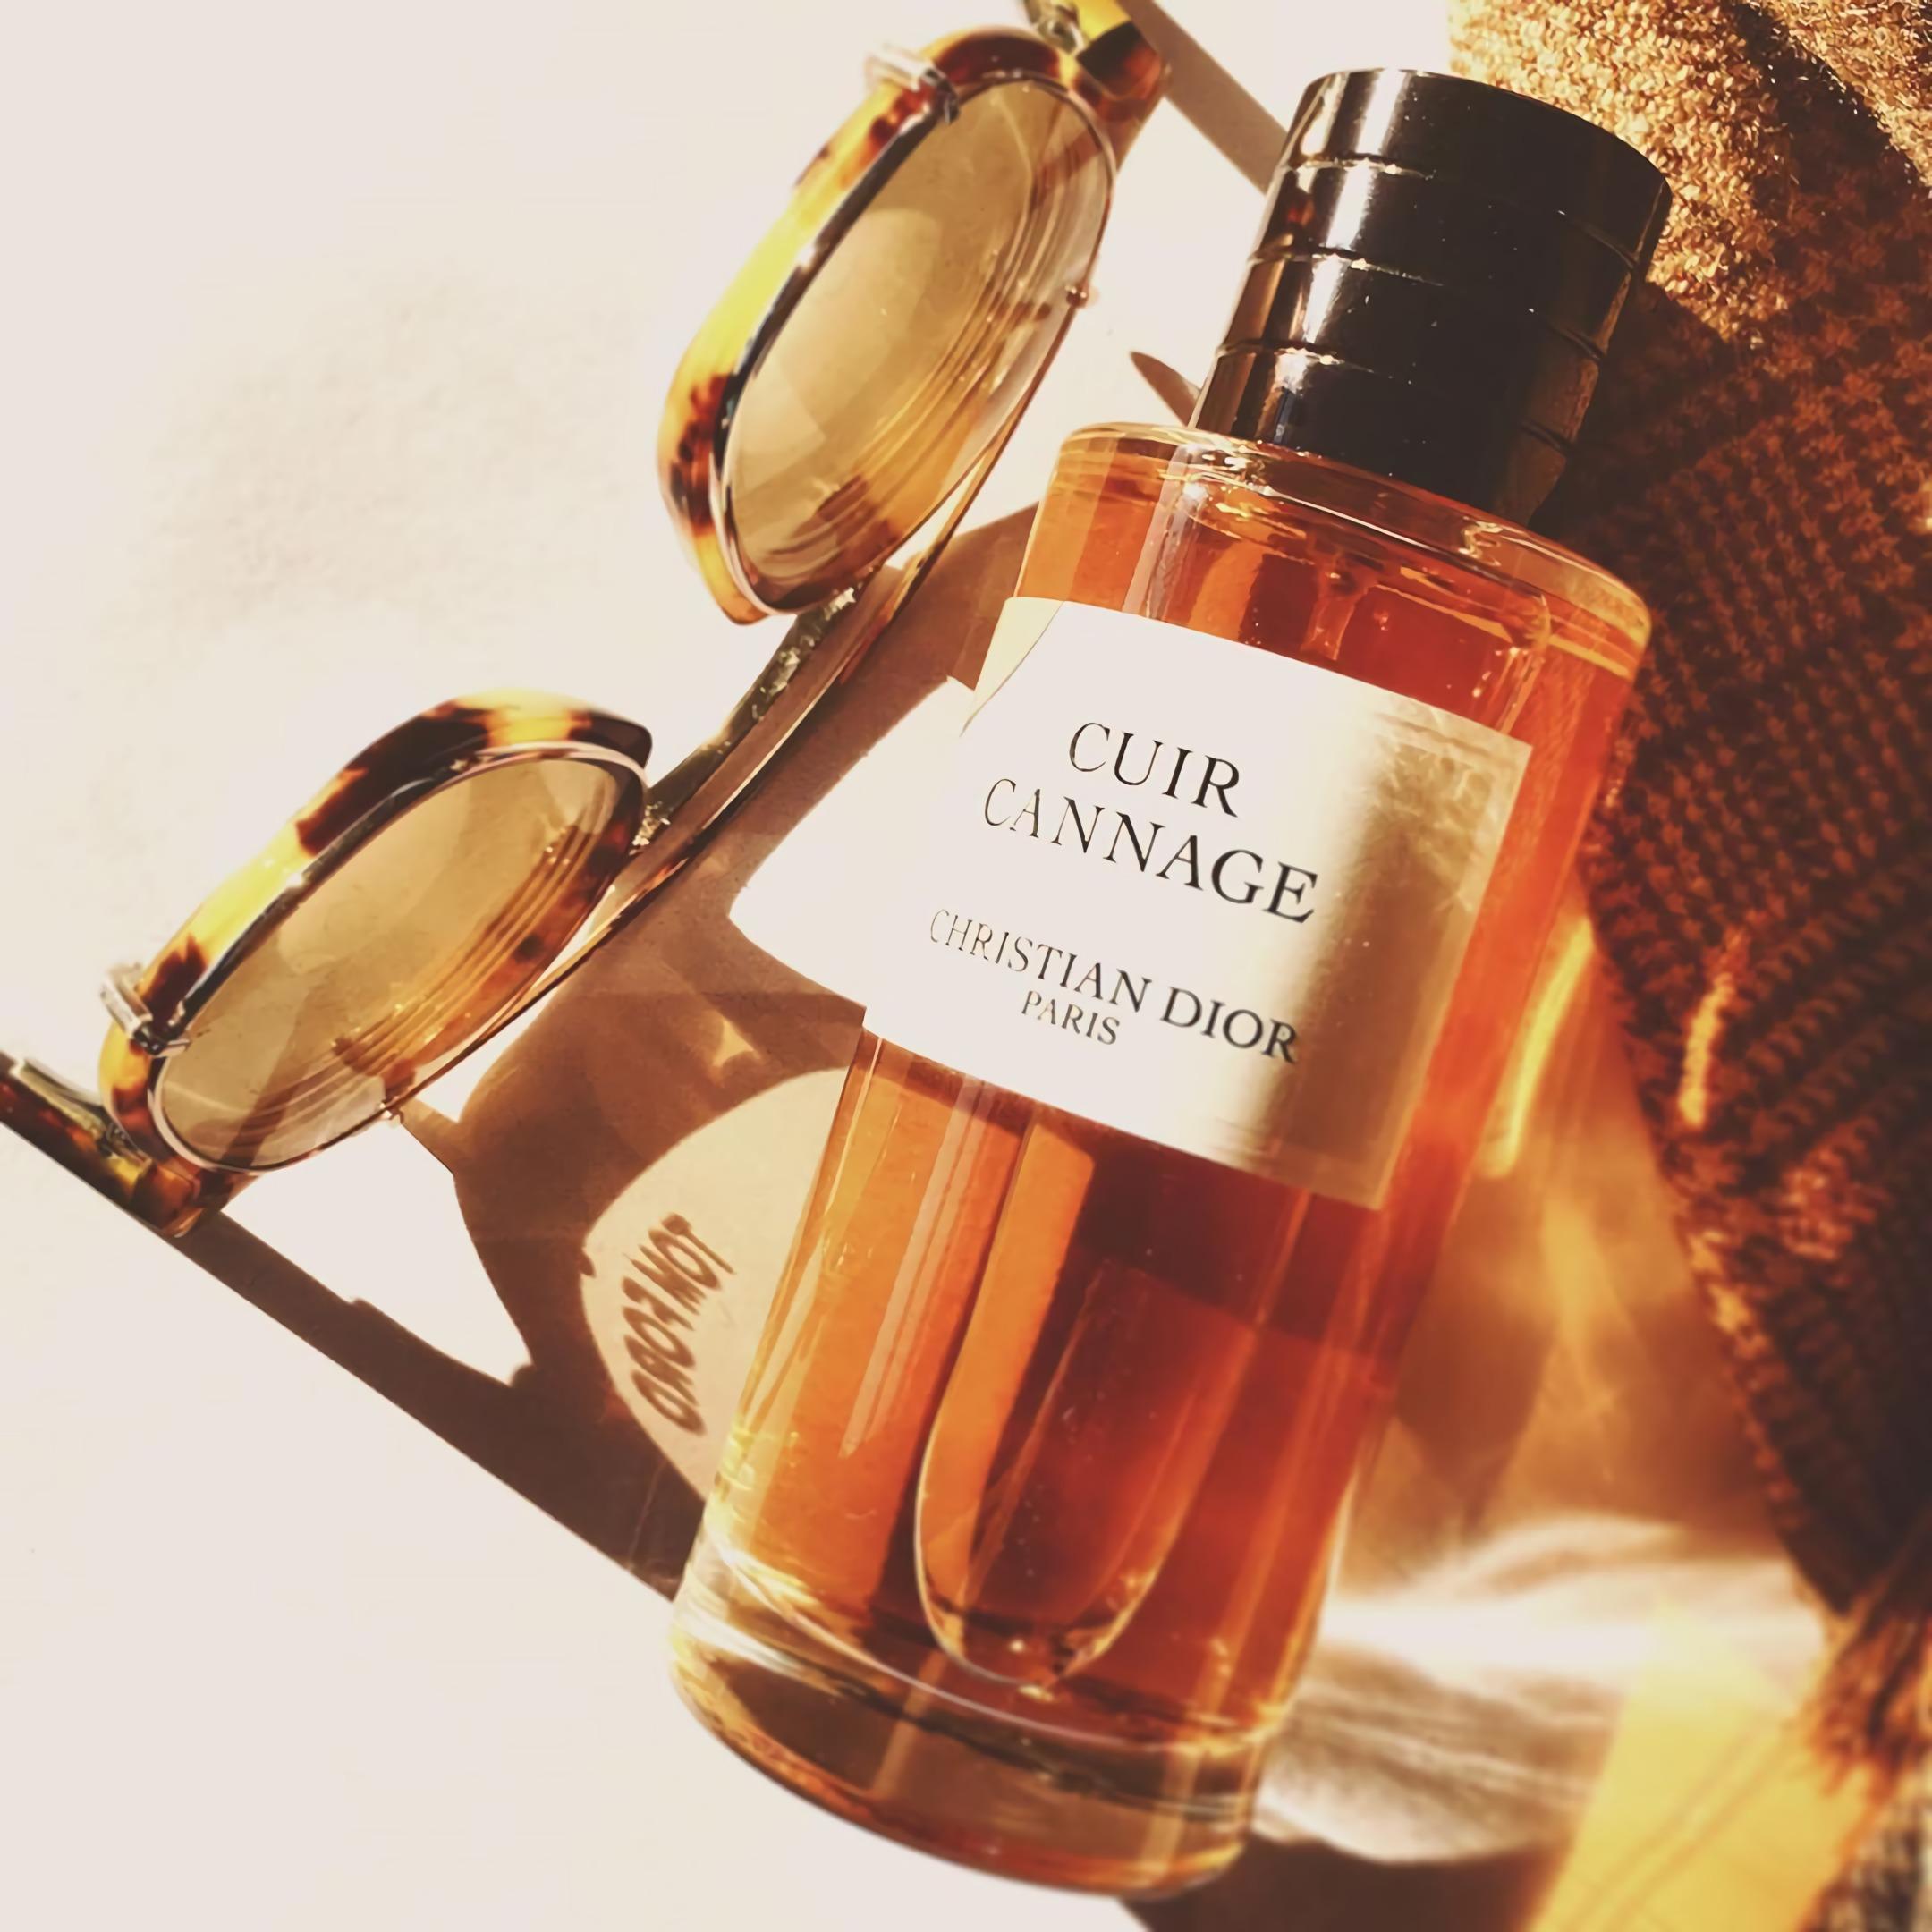 духи для мужчин с запахом кожи и цветов Dior Cuir Cannage